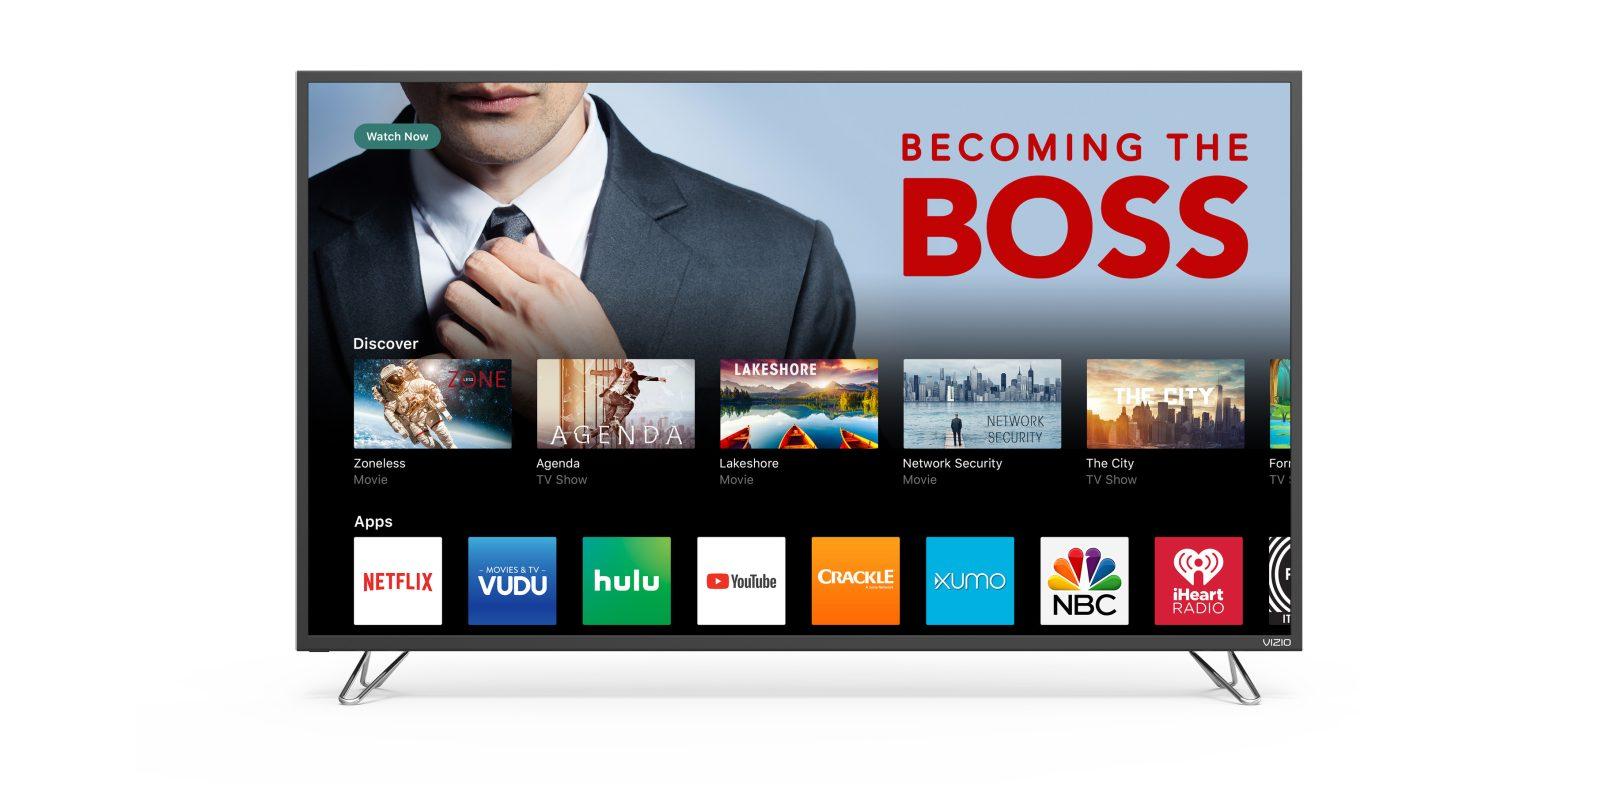 Upgrade to a new VIZIO Smart 4K UHDTV for football season from